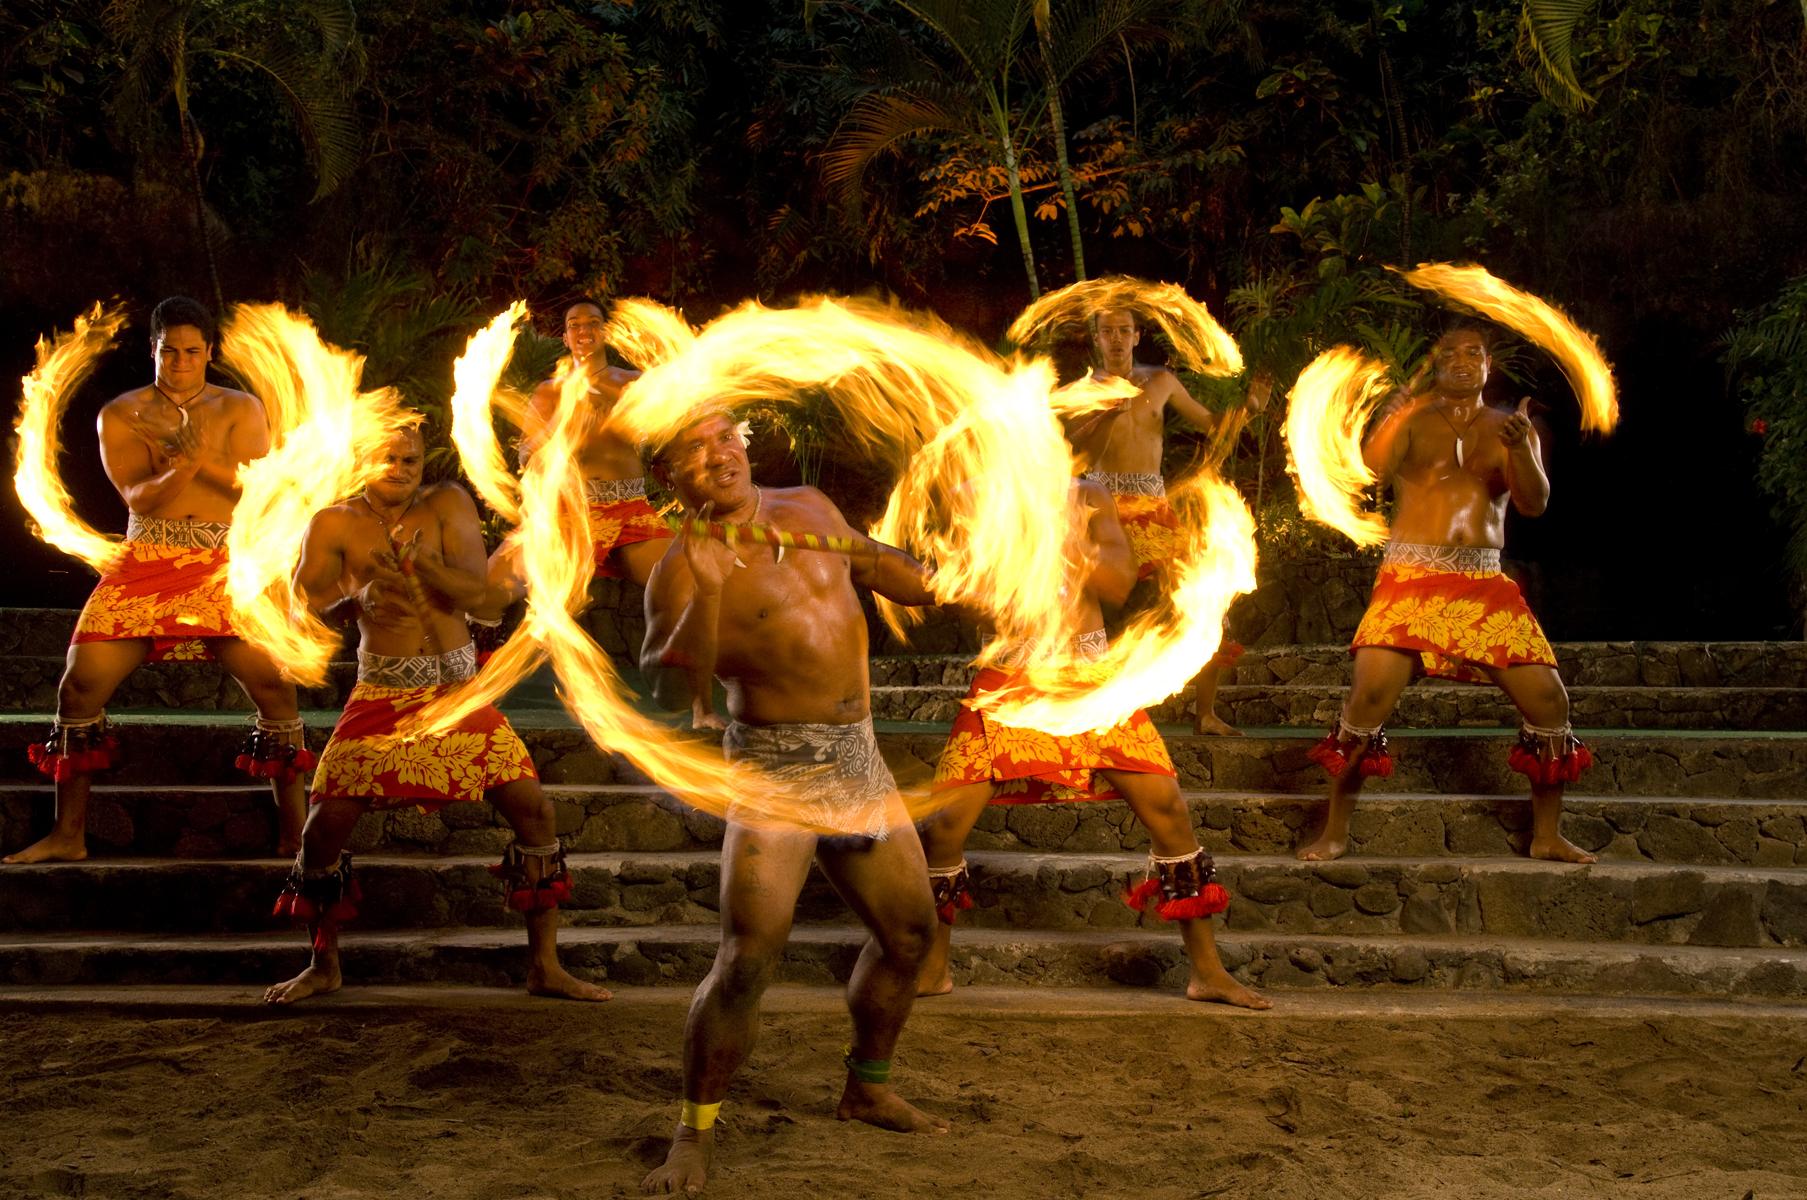 Polynesian Cultural Center Day Tour (Transfer + Performance + Dinner)